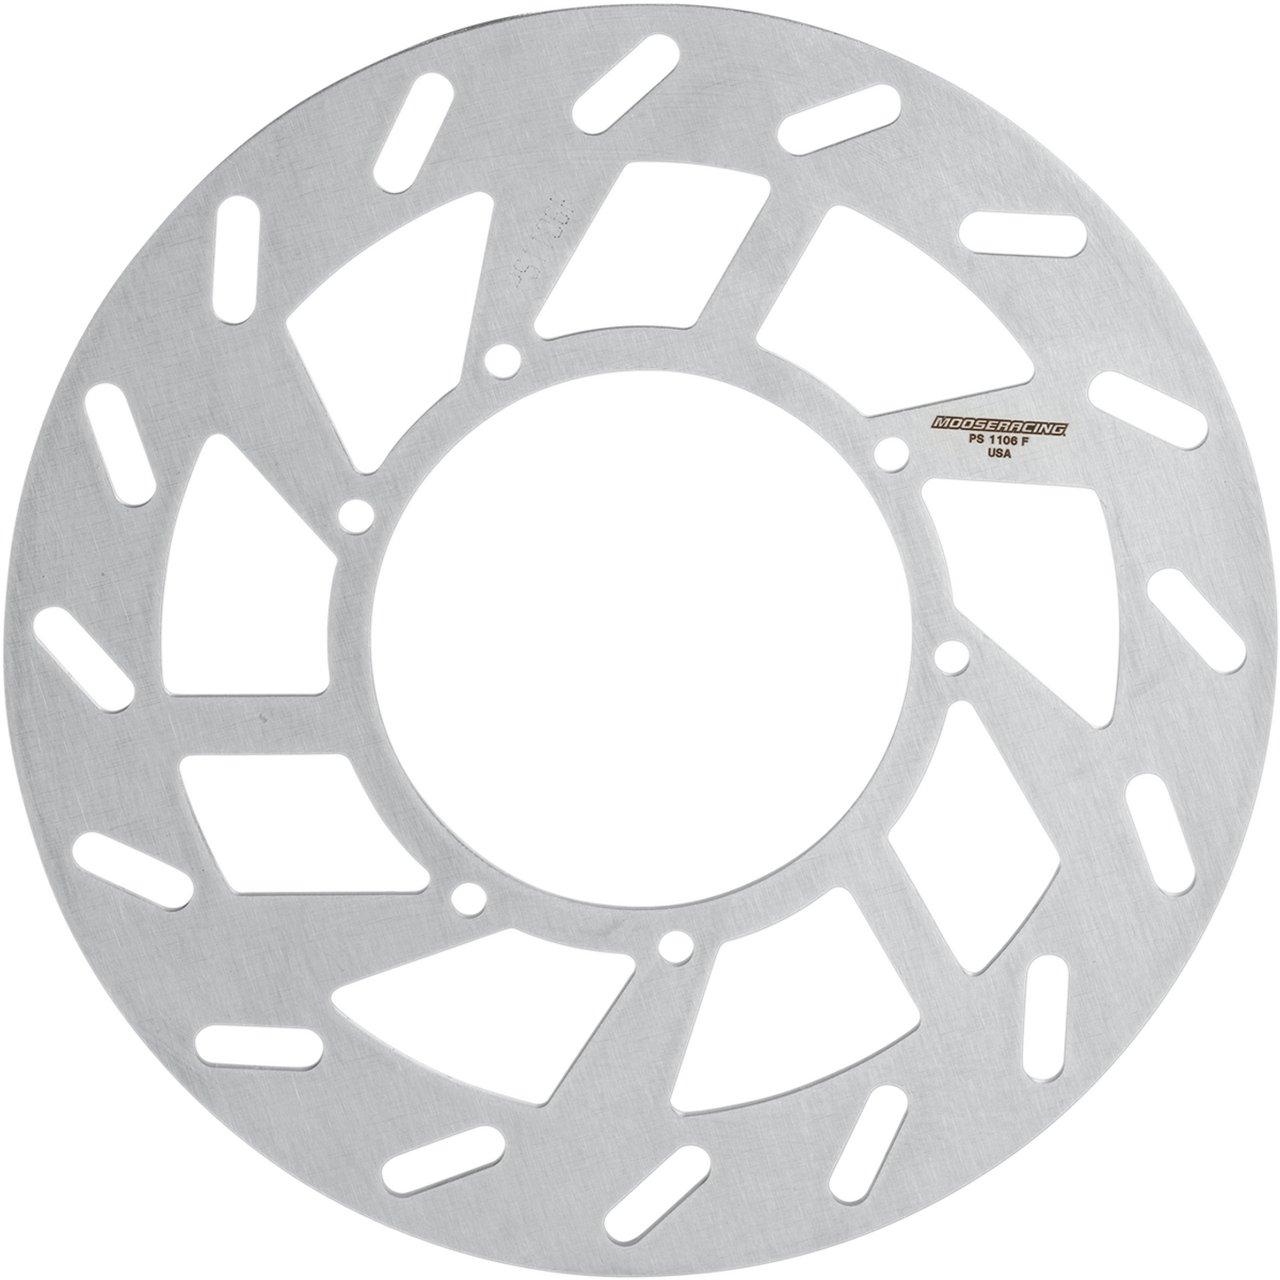 【MOOSE RACING】維修用煞車碟盤 [1711-0846] - 「Webike-摩托百貨」